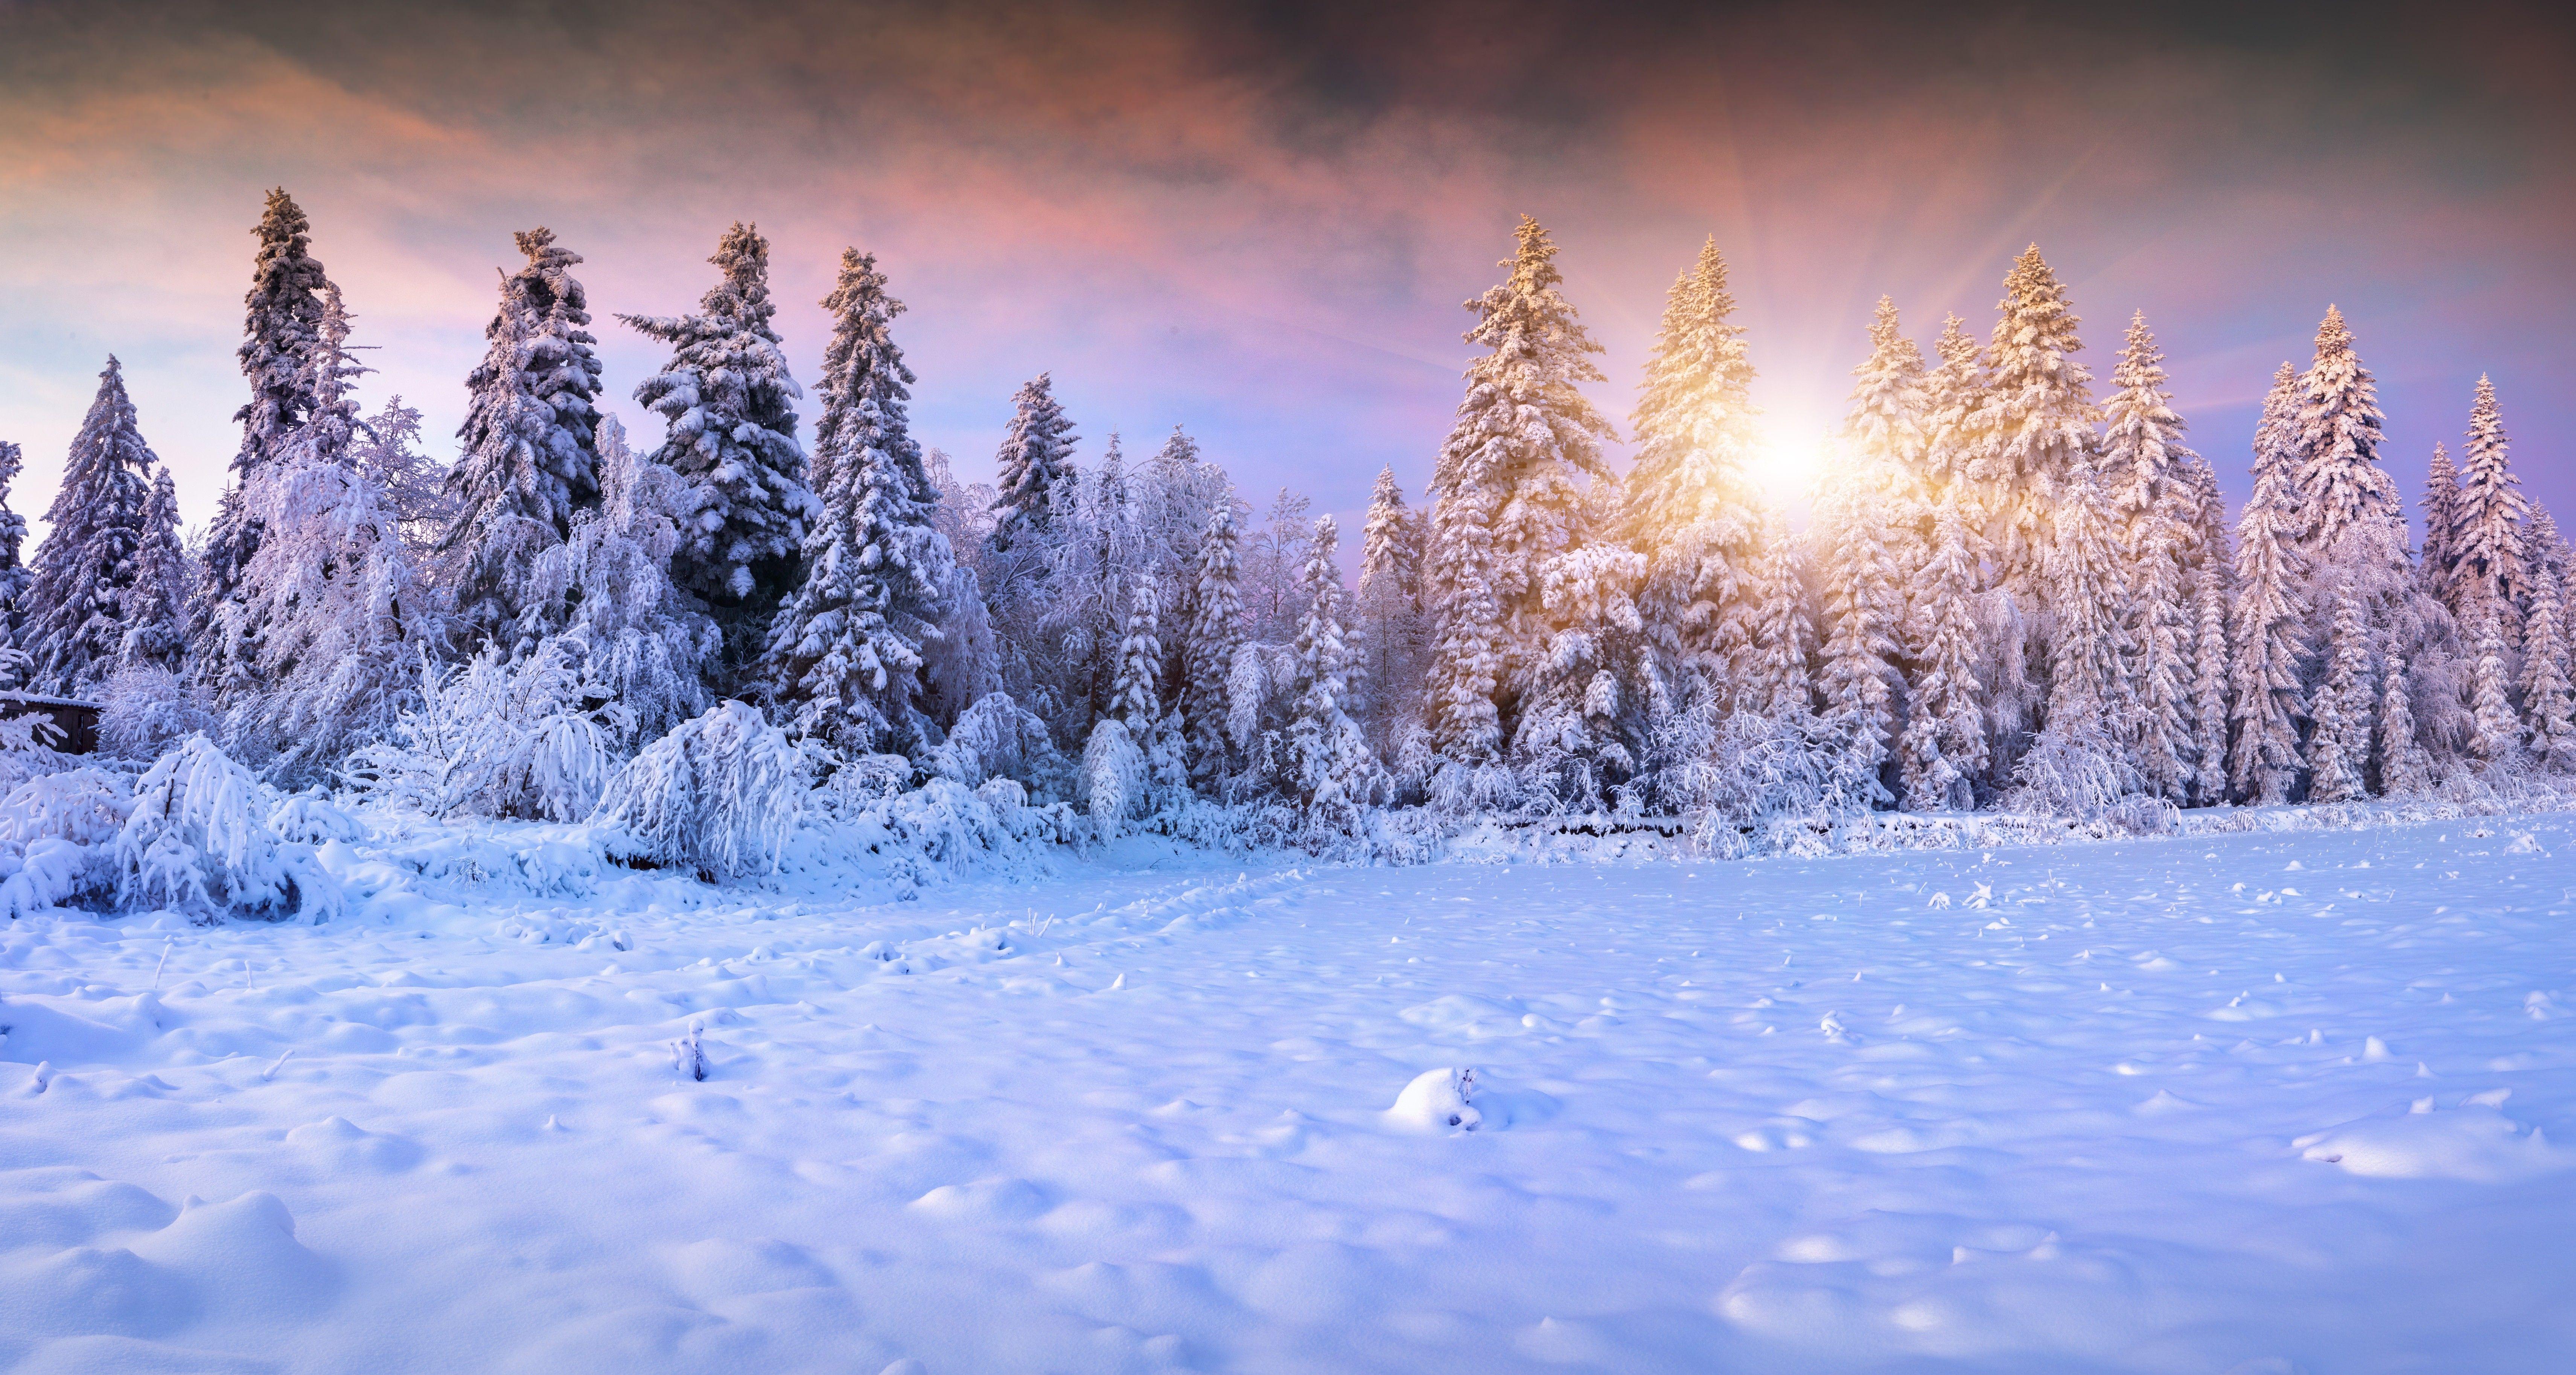 Winter Winter Forest Snow Fir Tree Sun Gallery For Hd 16 9 High Winter Wallpaper Winter Snow Wallpaper Winter Backdrops